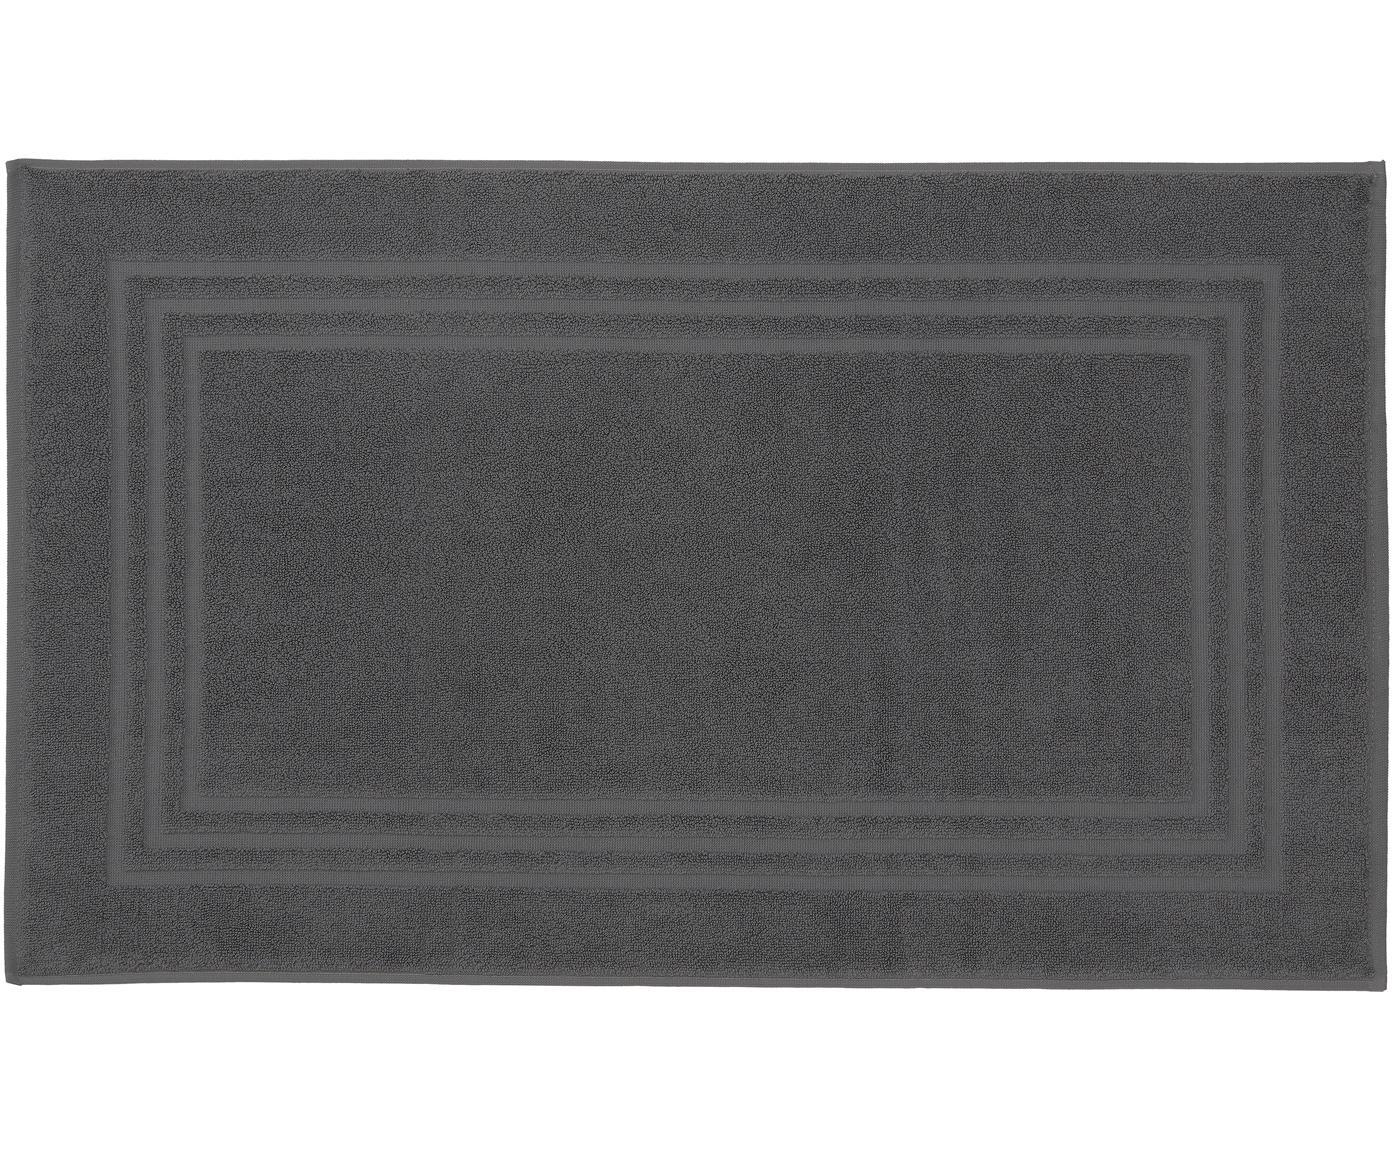 Alfombrilla de baño Gentle, Algodón, Gris oscuro, An 50 x L 80 cm